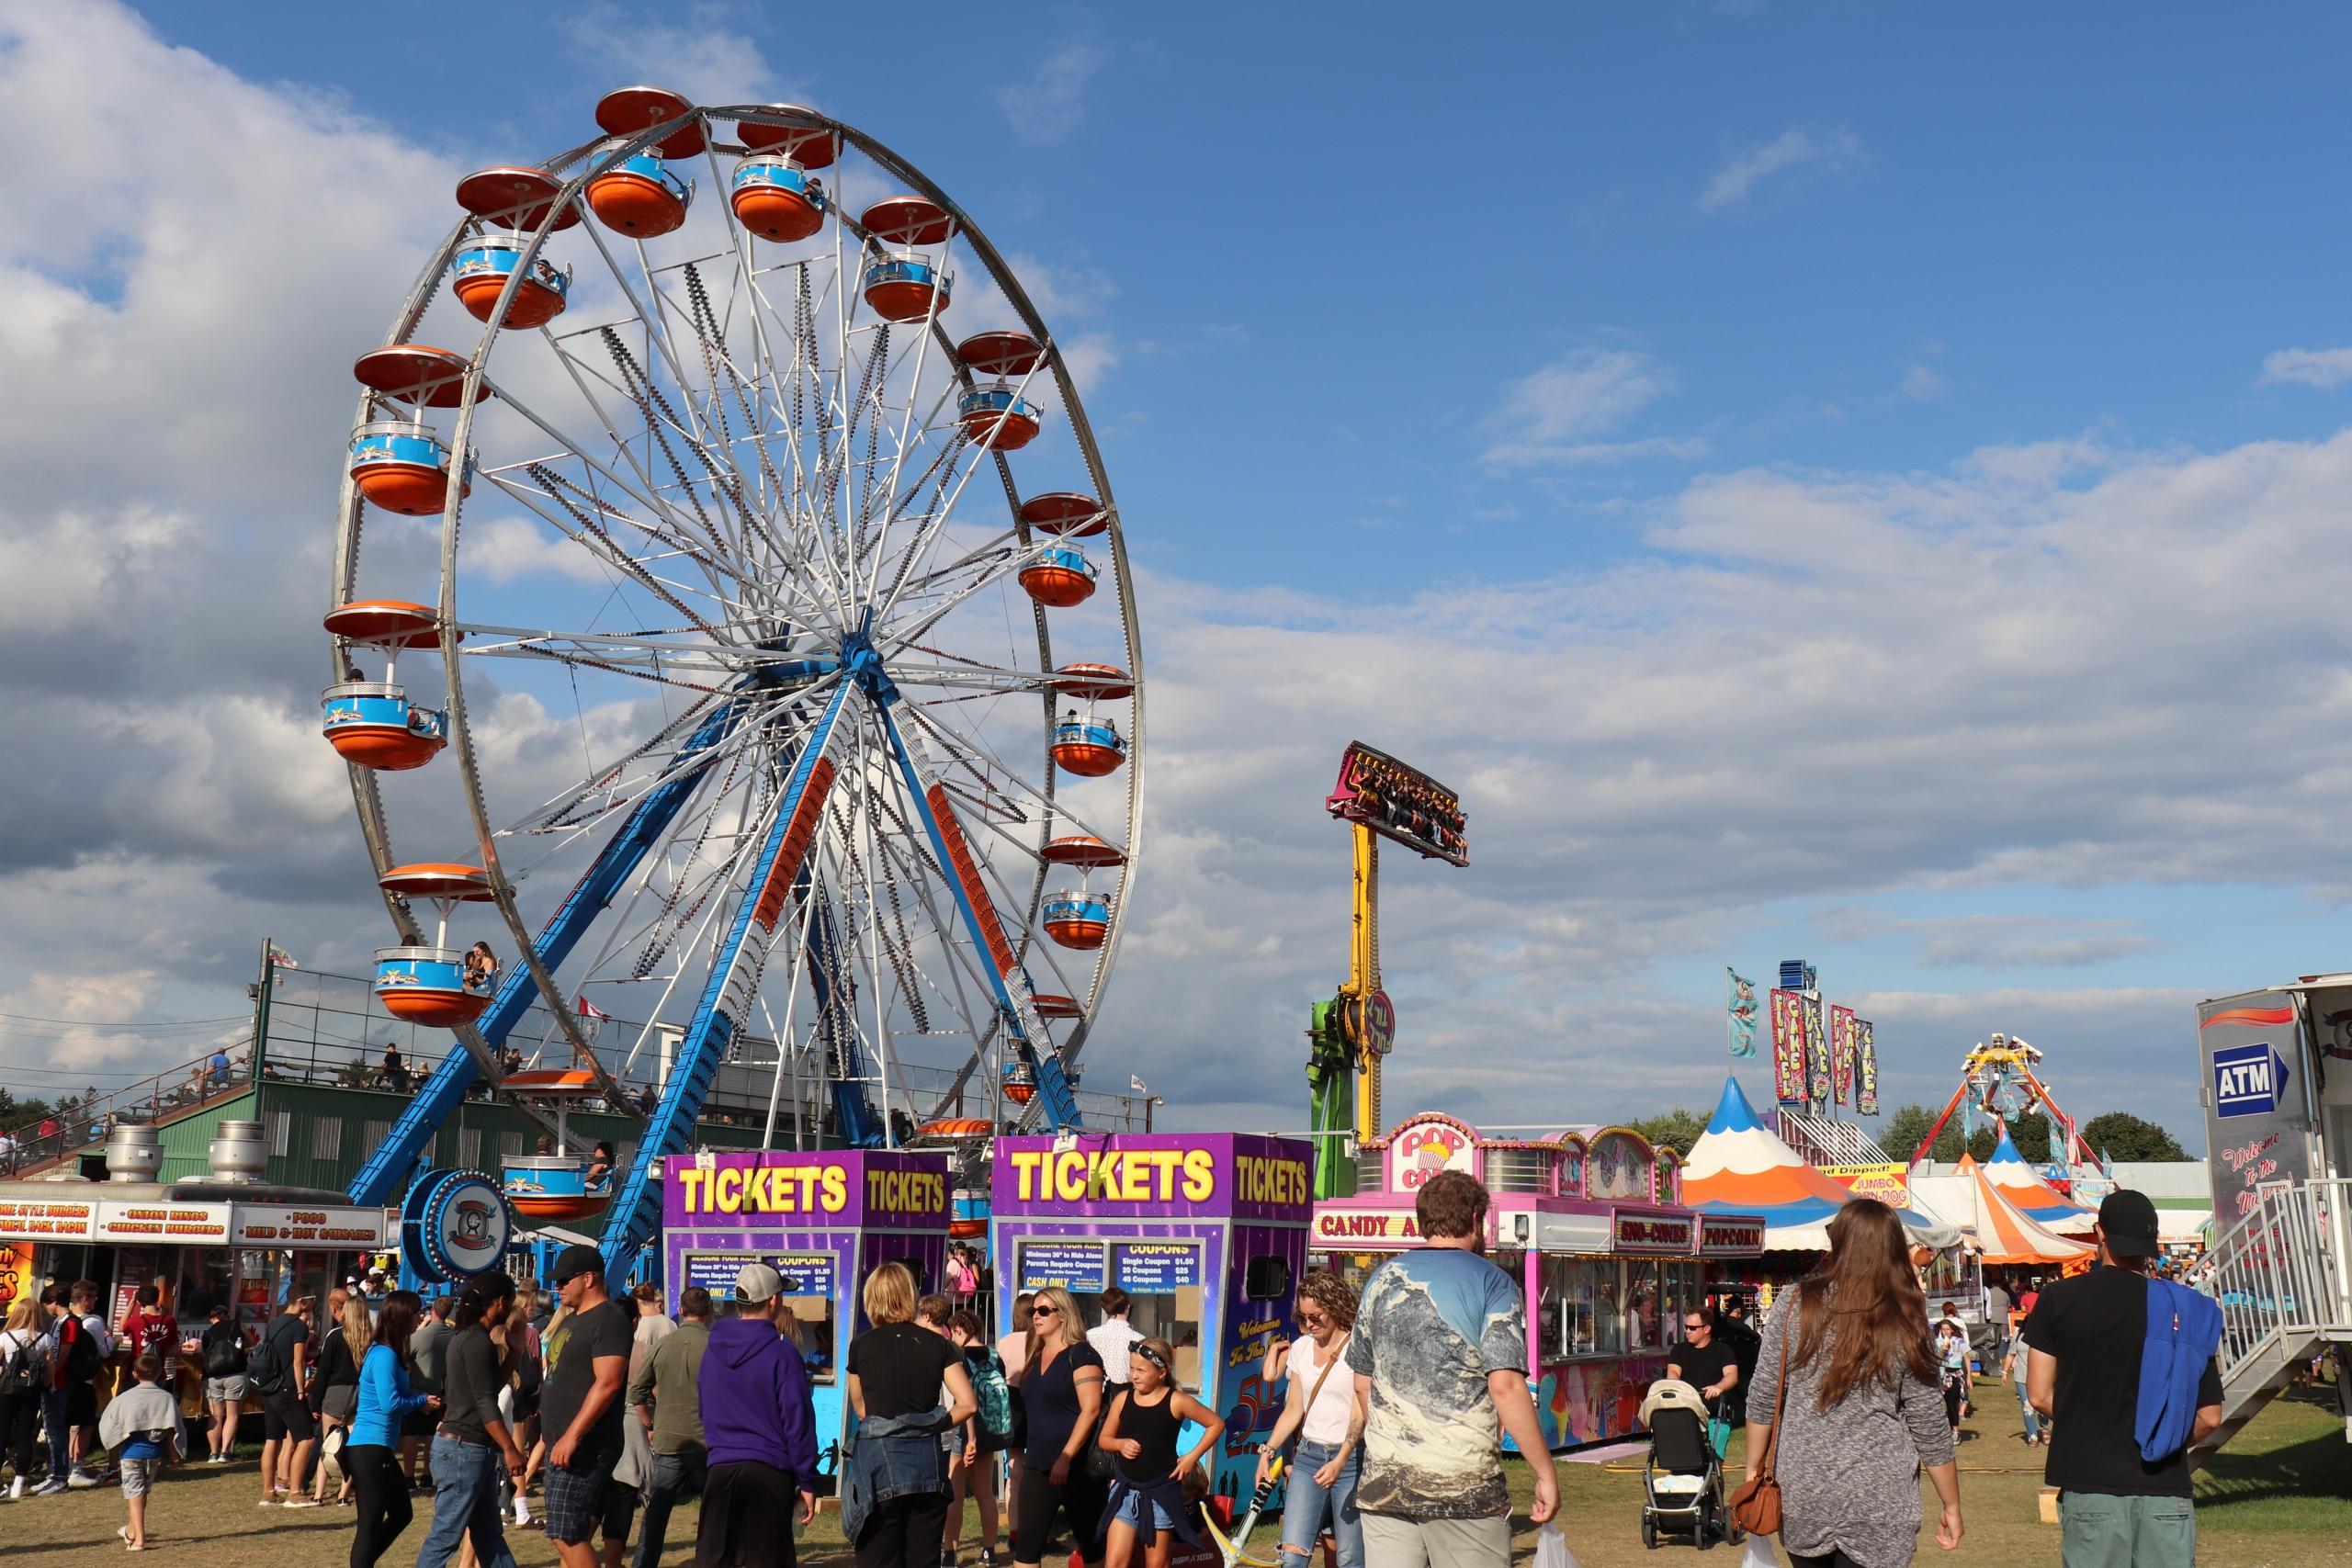 Paris Fair - Ferris Wheel